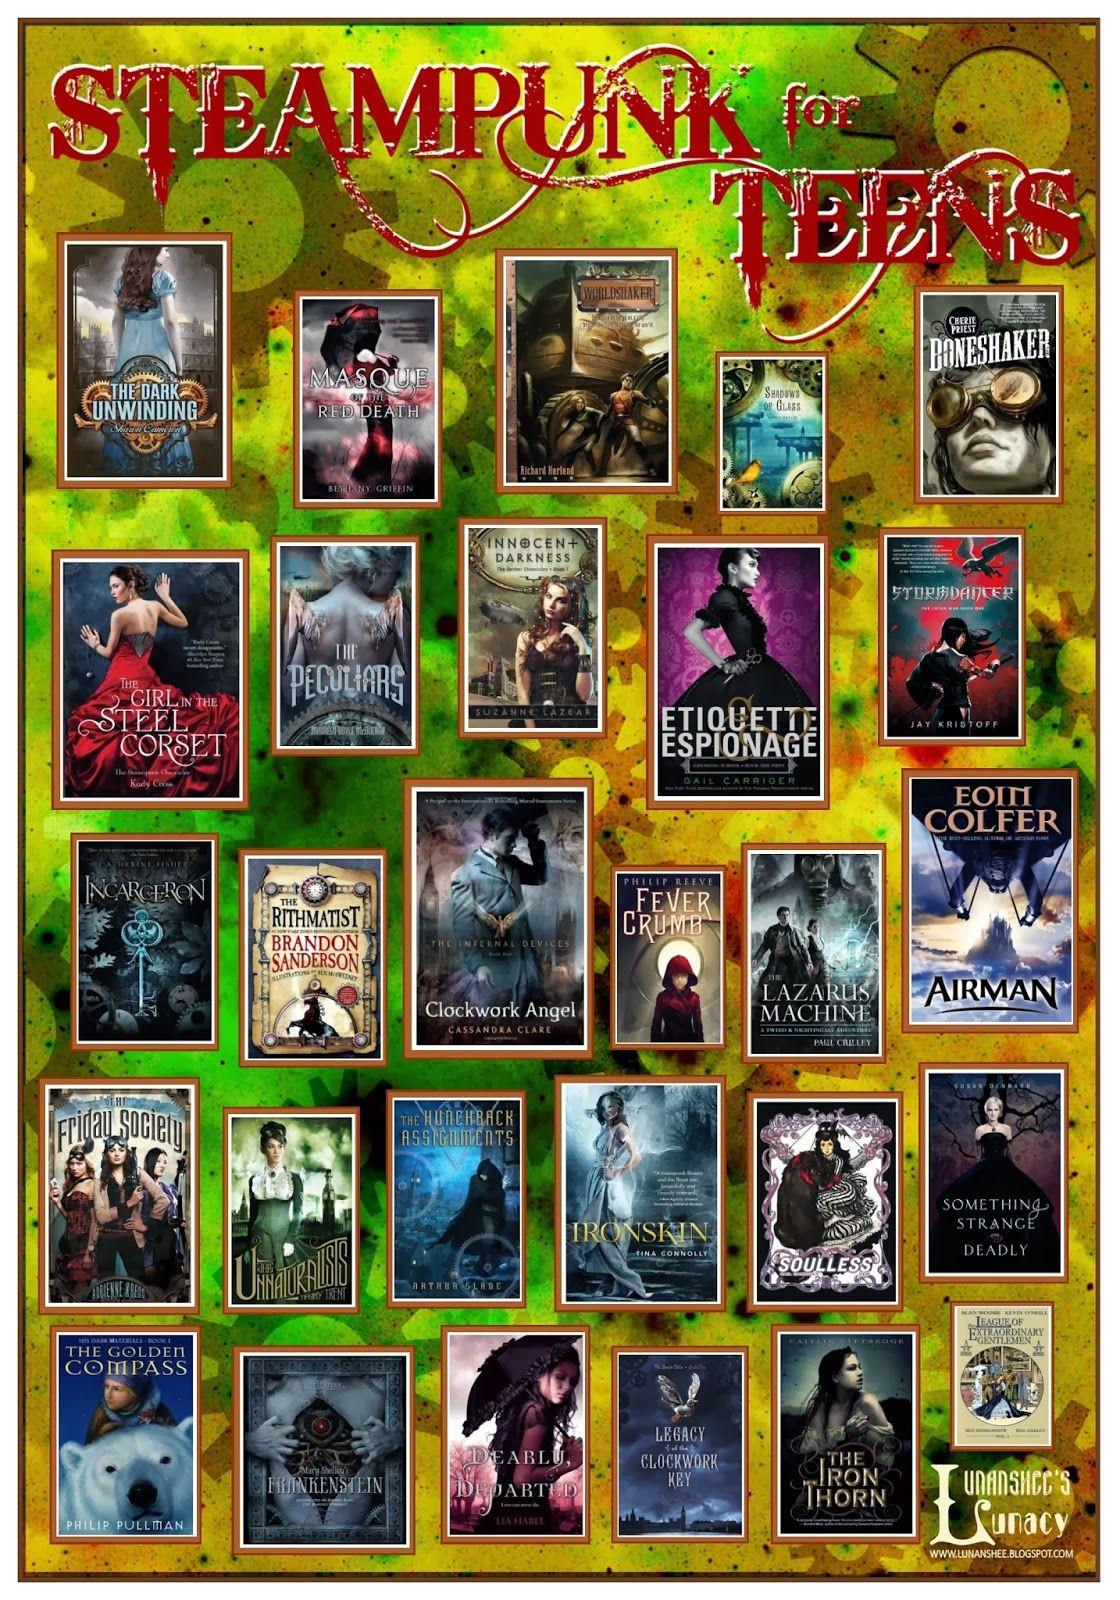 Lunanshee' Lunacy Steampunk Teens Book Poster